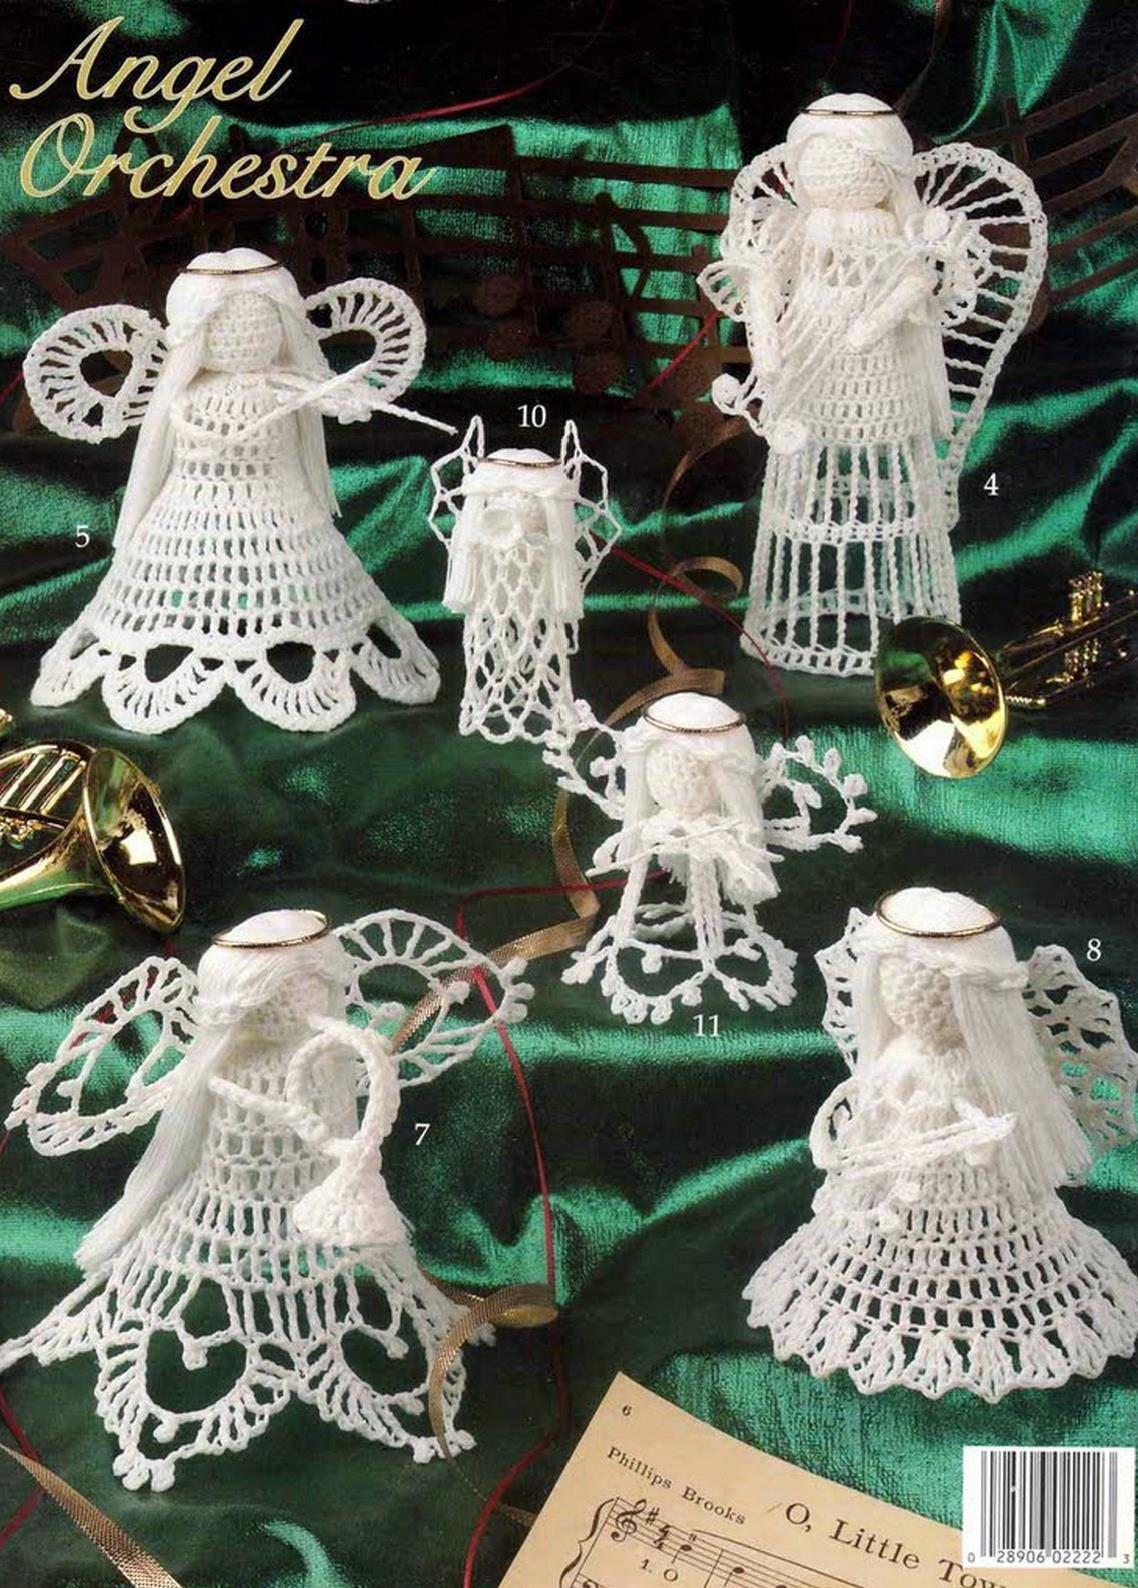 Angels Orchestra Crochet Lace Pattern Crochet Angels Little Angels